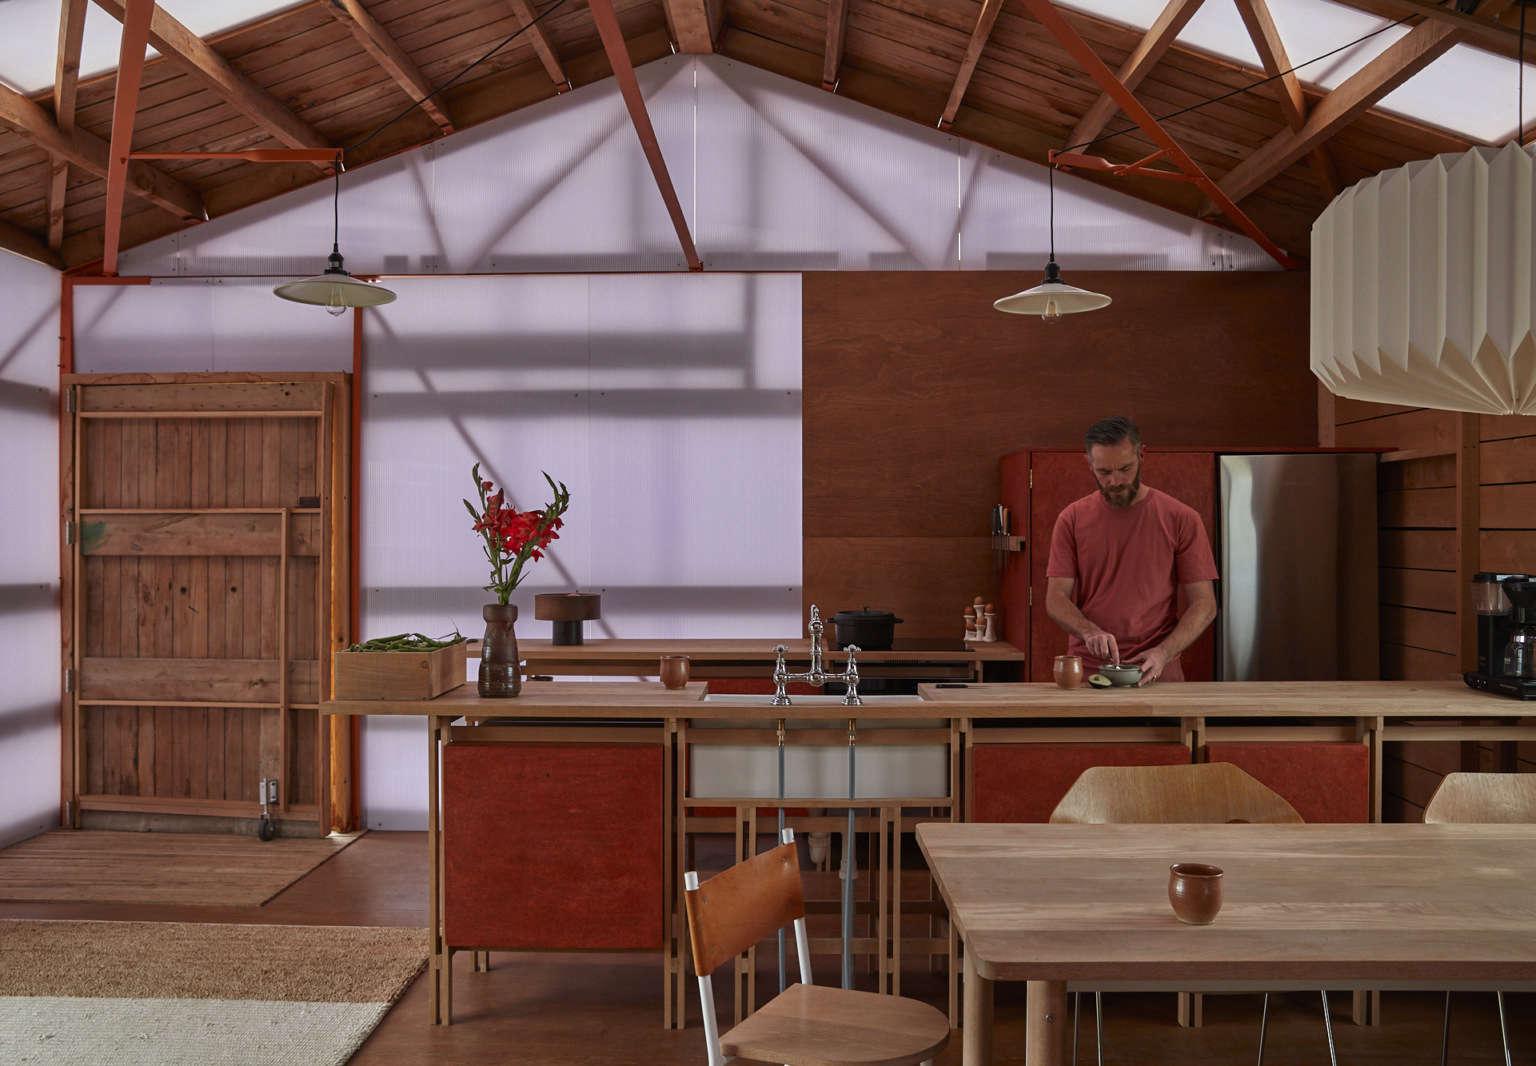 shearing shed kitchen ben daly palace electric 6